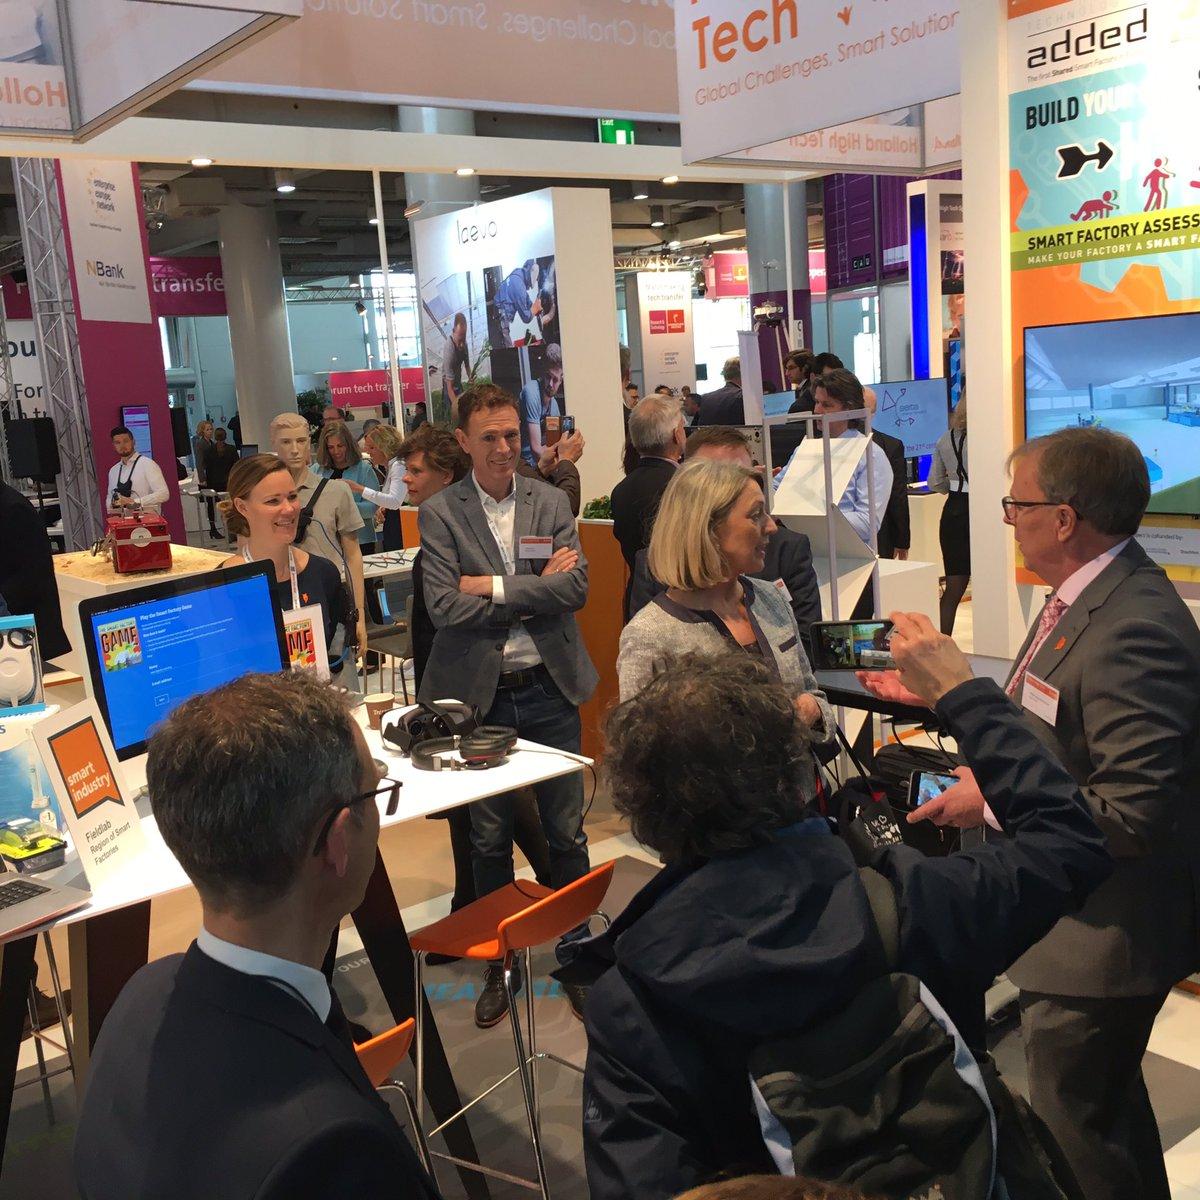 Visit Northern Netherlands, Region of Smart Factories at the Hannover Messe, Hall 8 D34